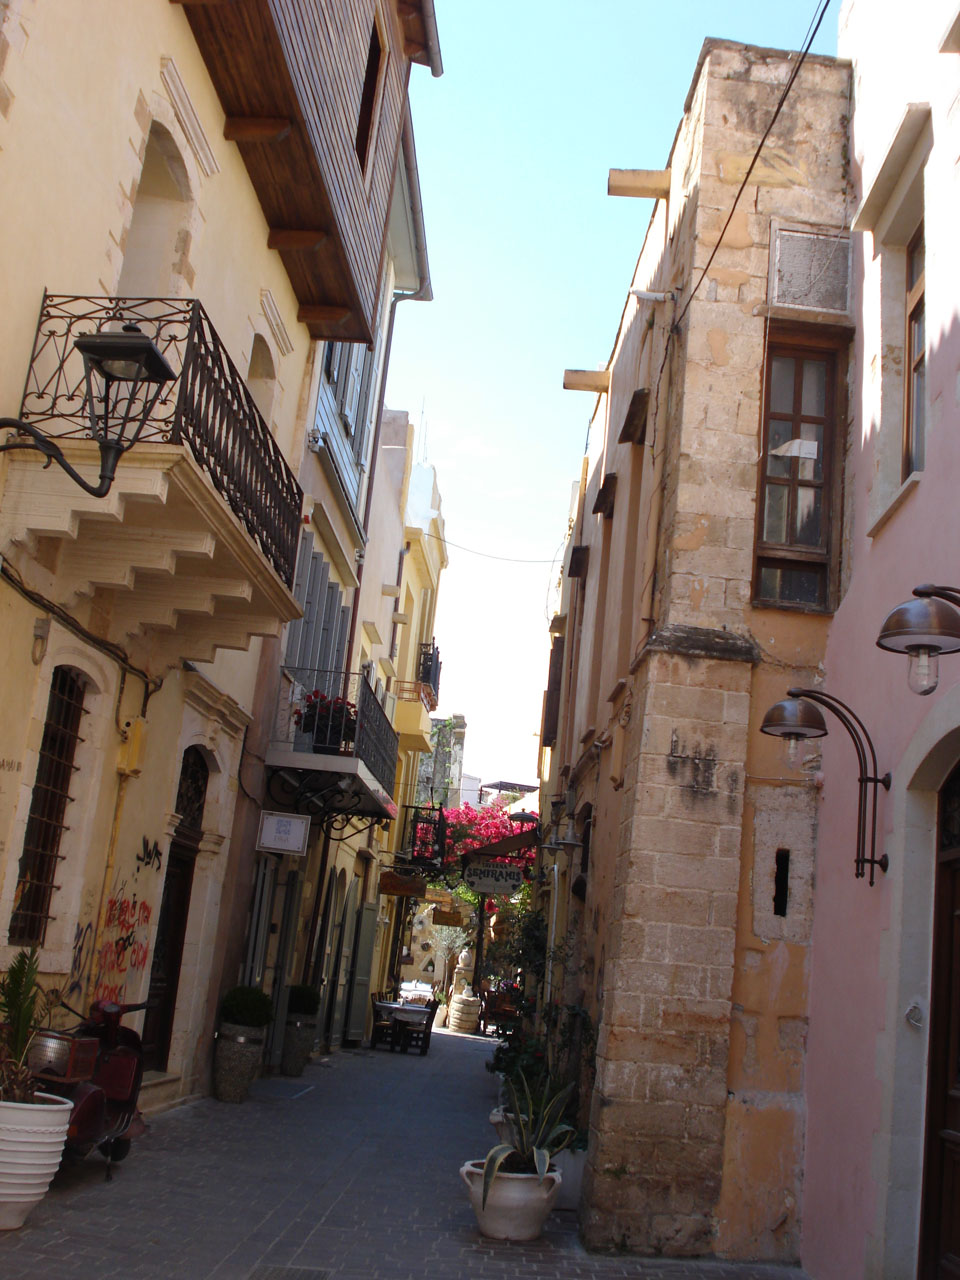 English To Italian Translator Google: Renaissance Monastery Of Agia Triada And The Beautiful Old